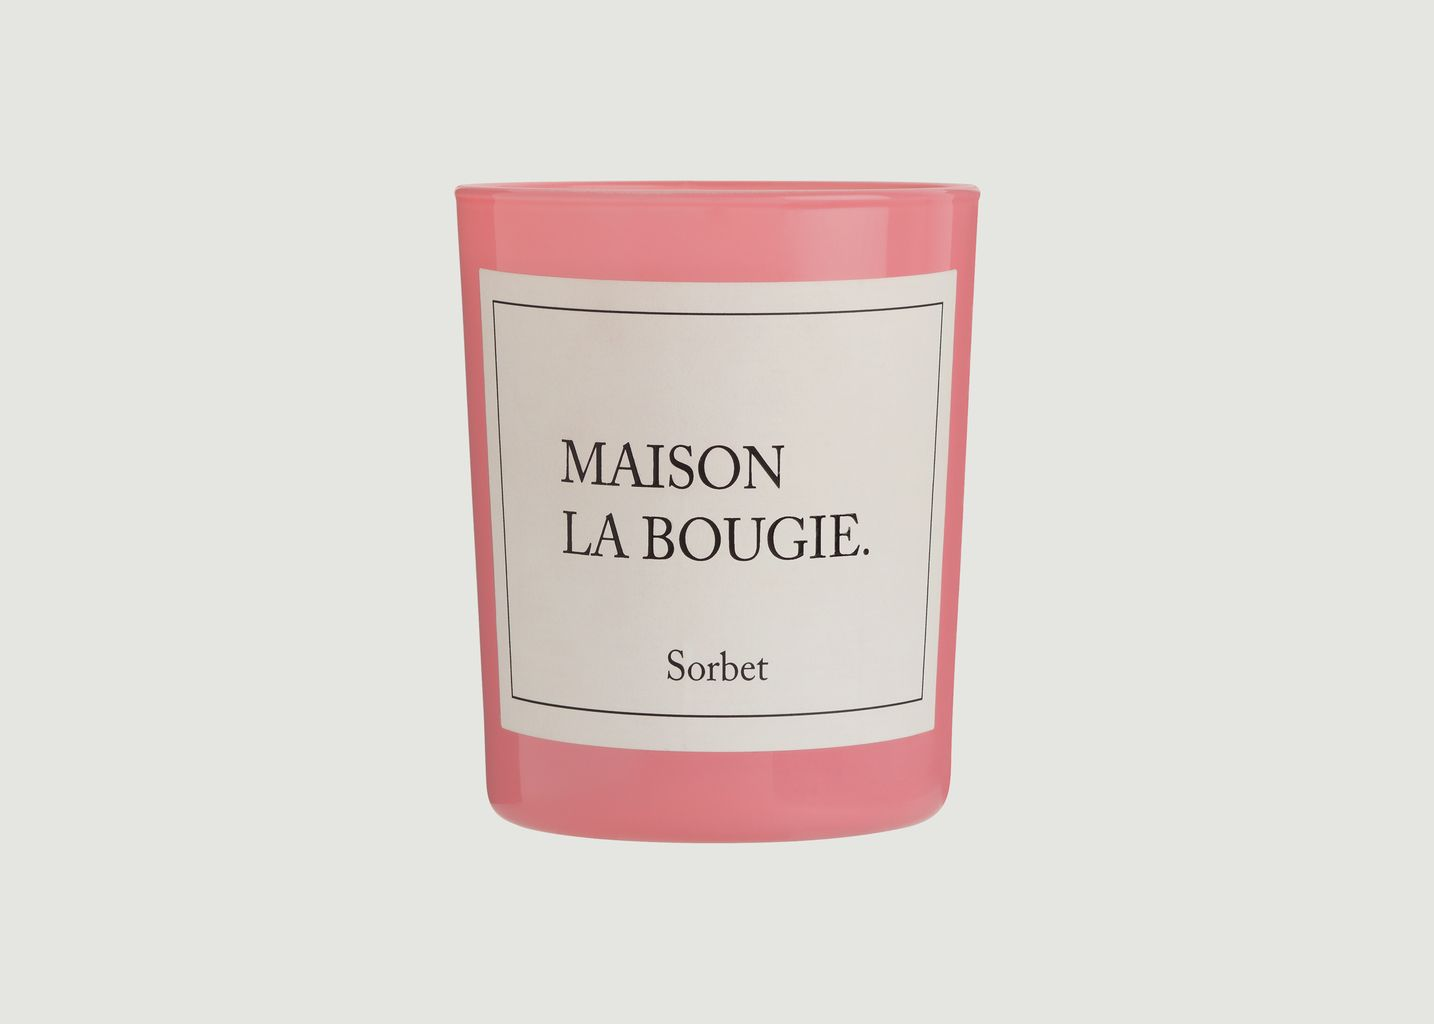 Bougie Sorbet - Maison La Bougie